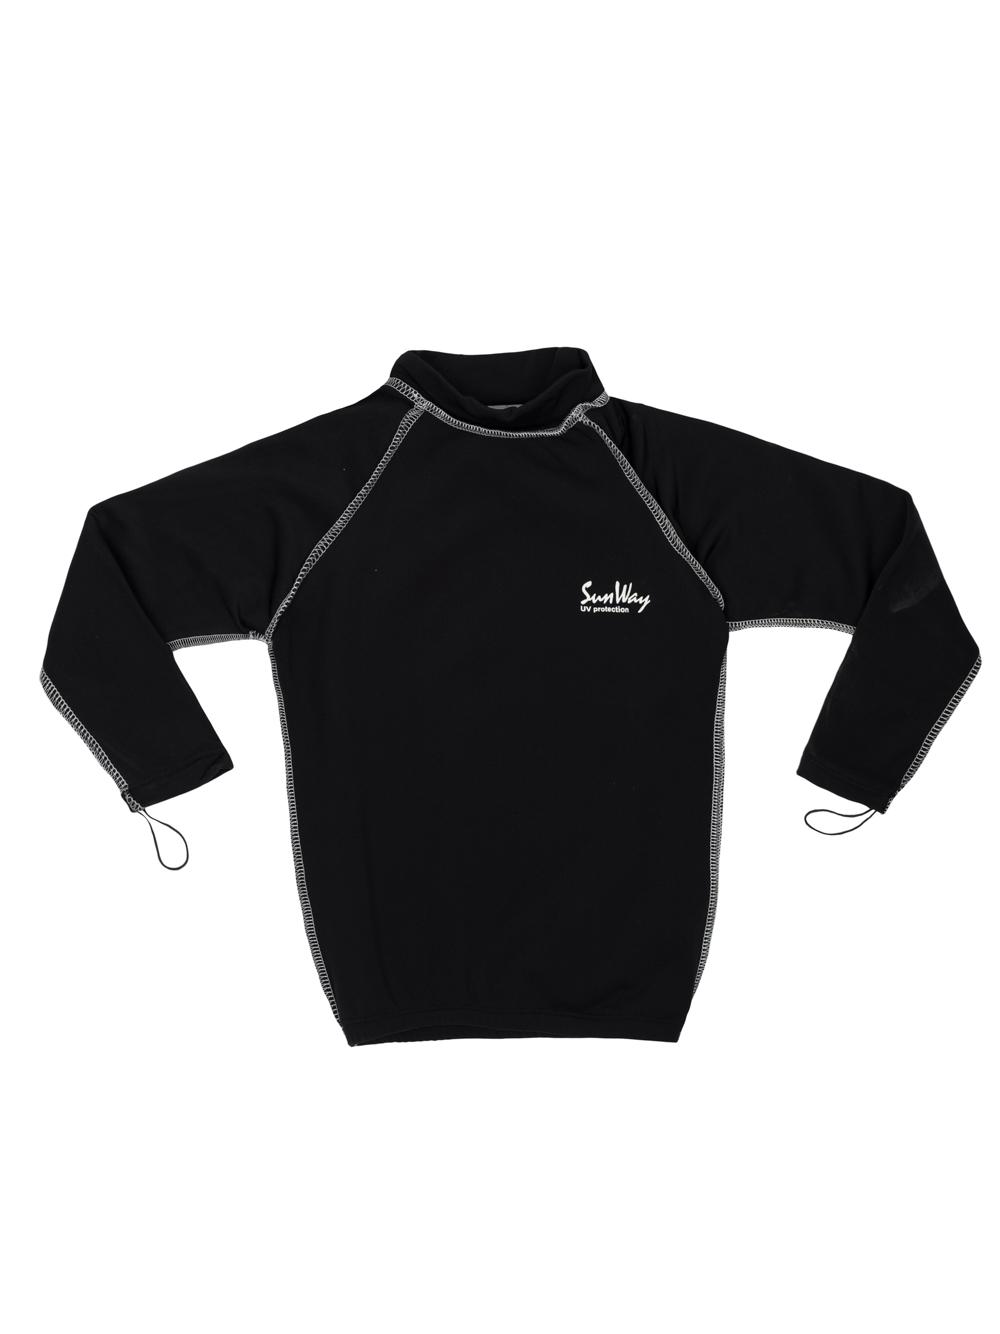 SunWay Kids  Boys Swimwear Swimsuit Sun suit Sun Protection UV UPF  50+